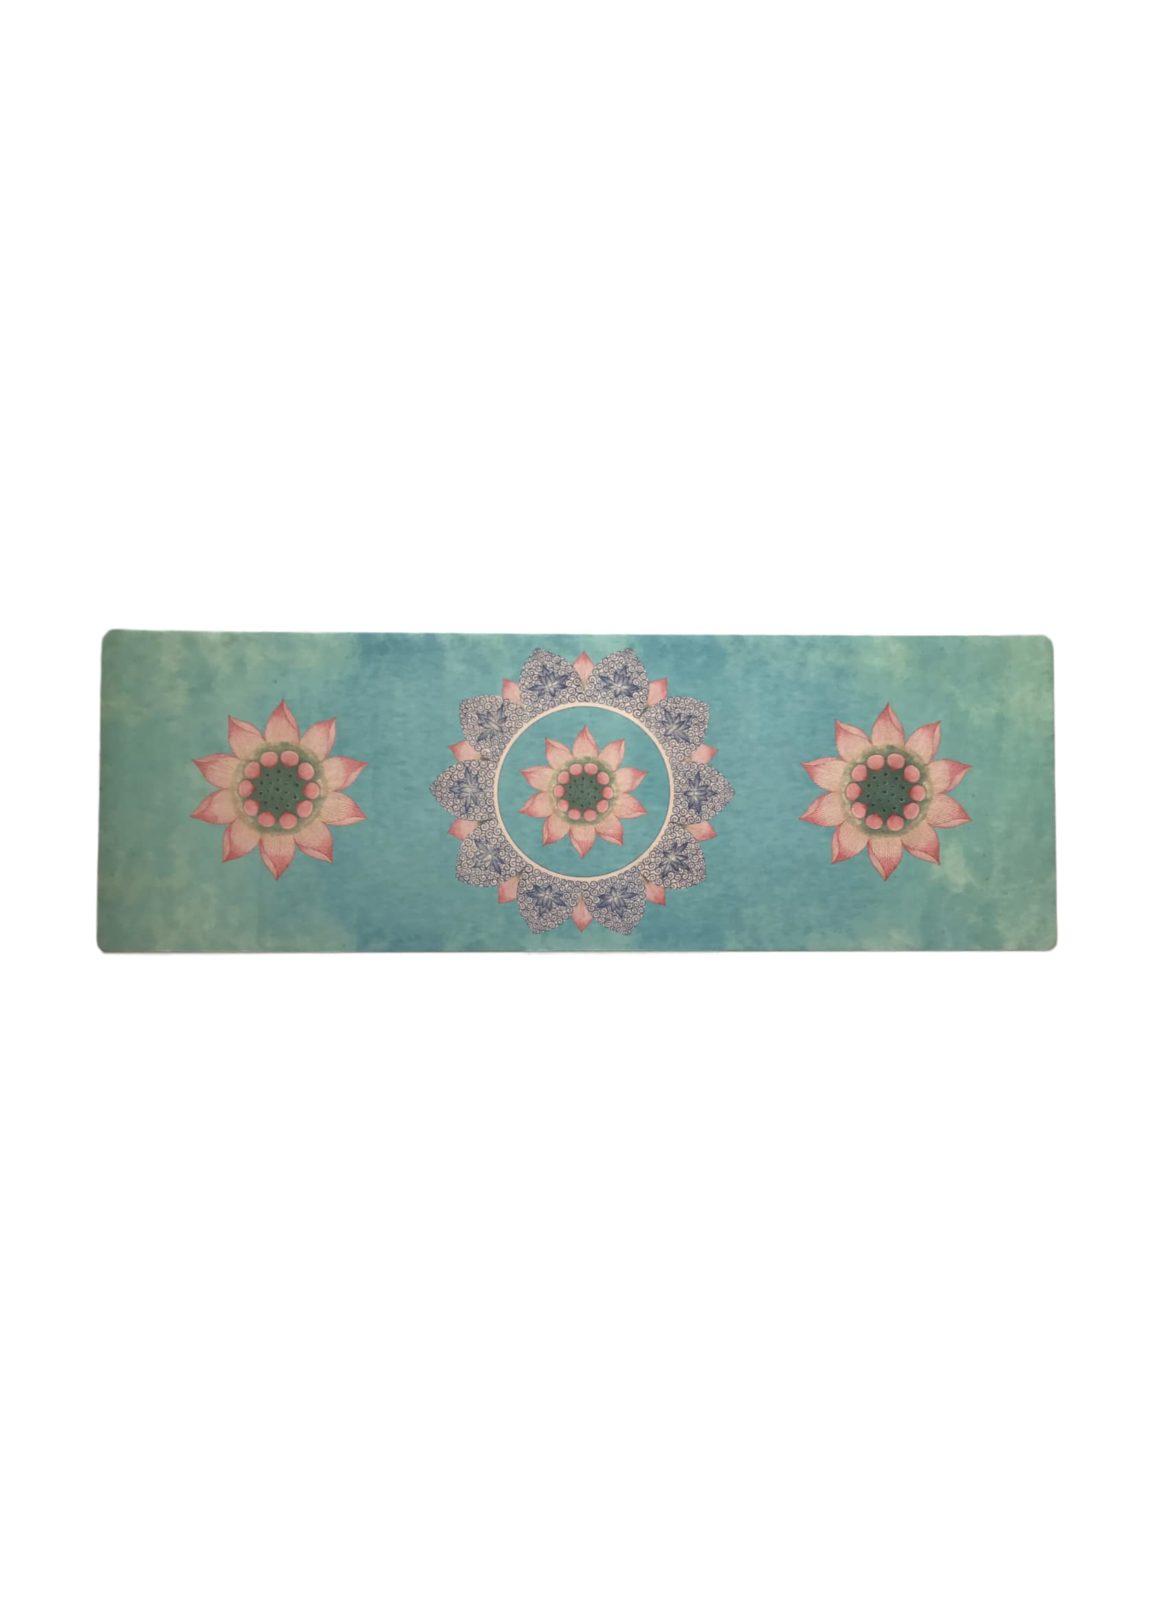 Sitara-Rao-Floral-yoga-mat